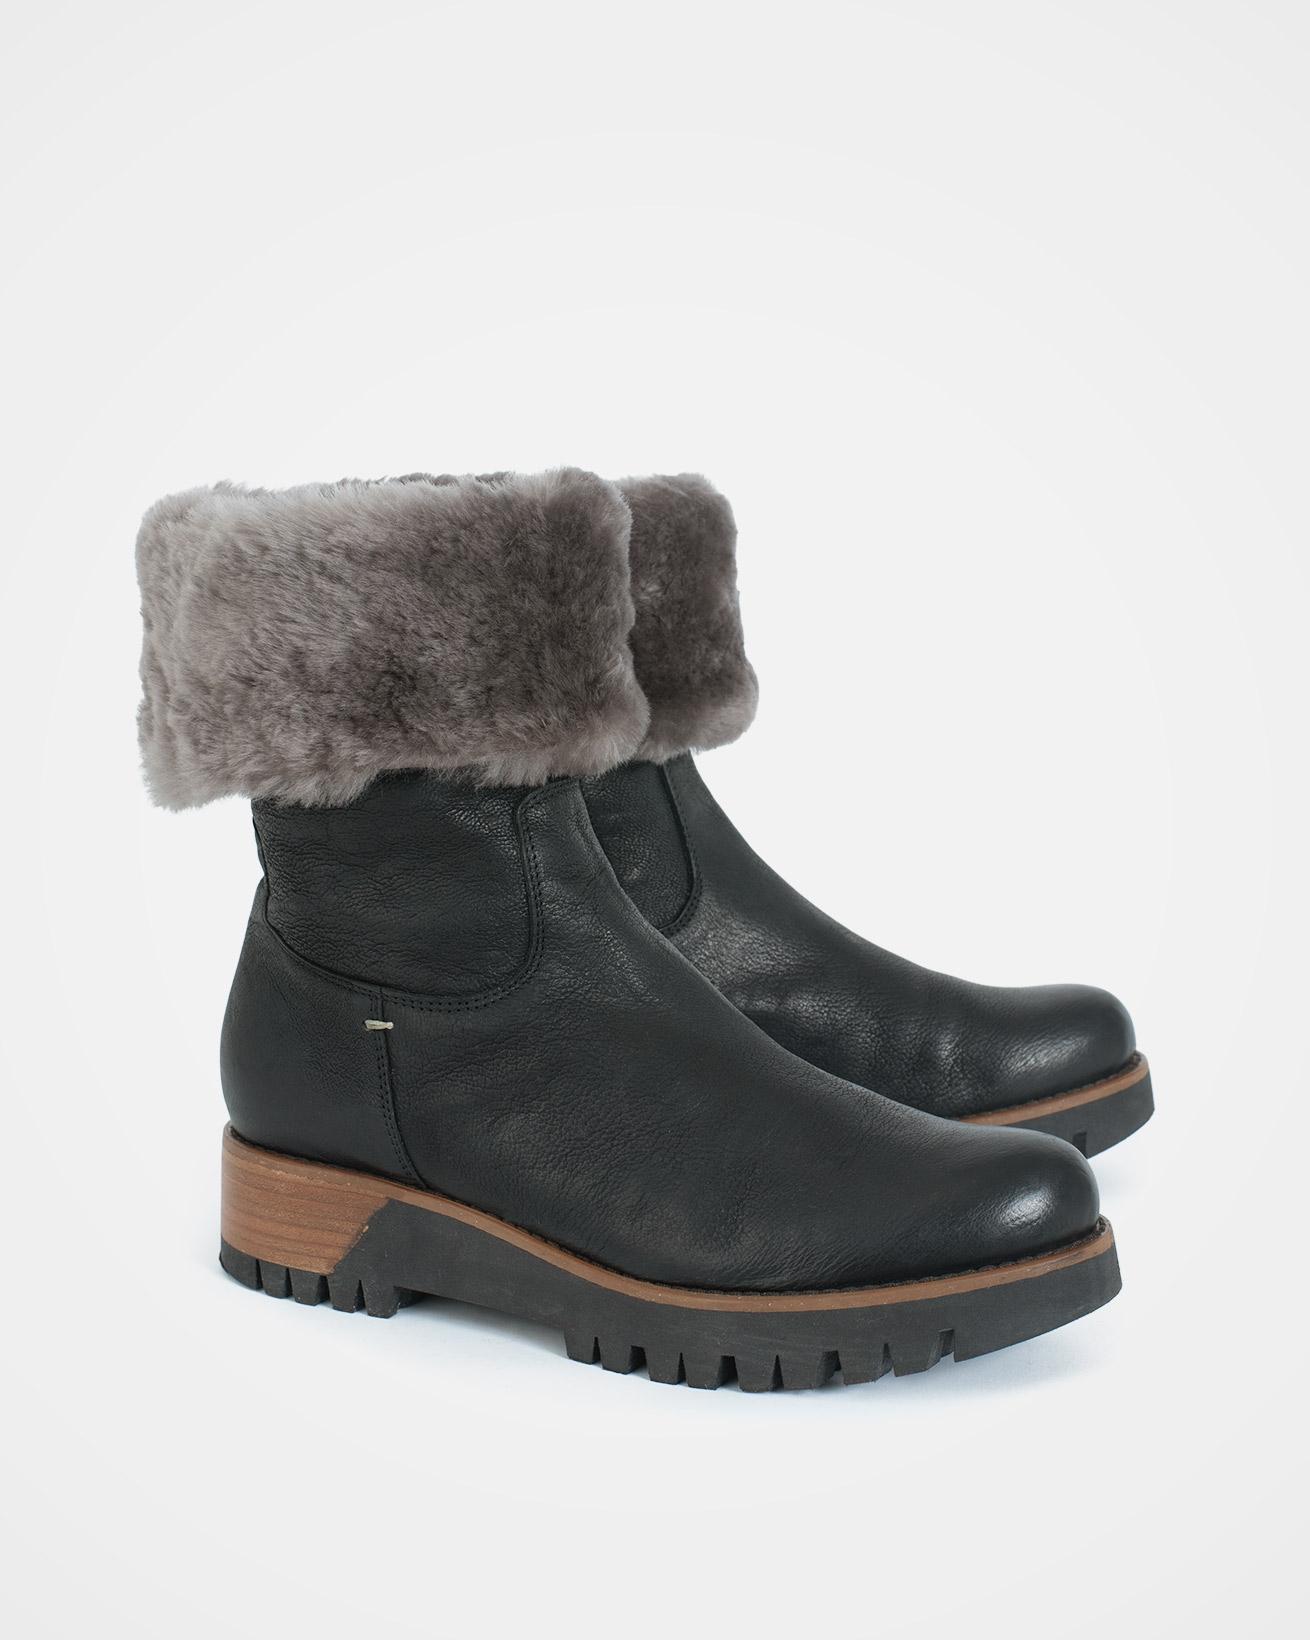 Cuffed Nubuck Boots - Size 37 - Black - 1728